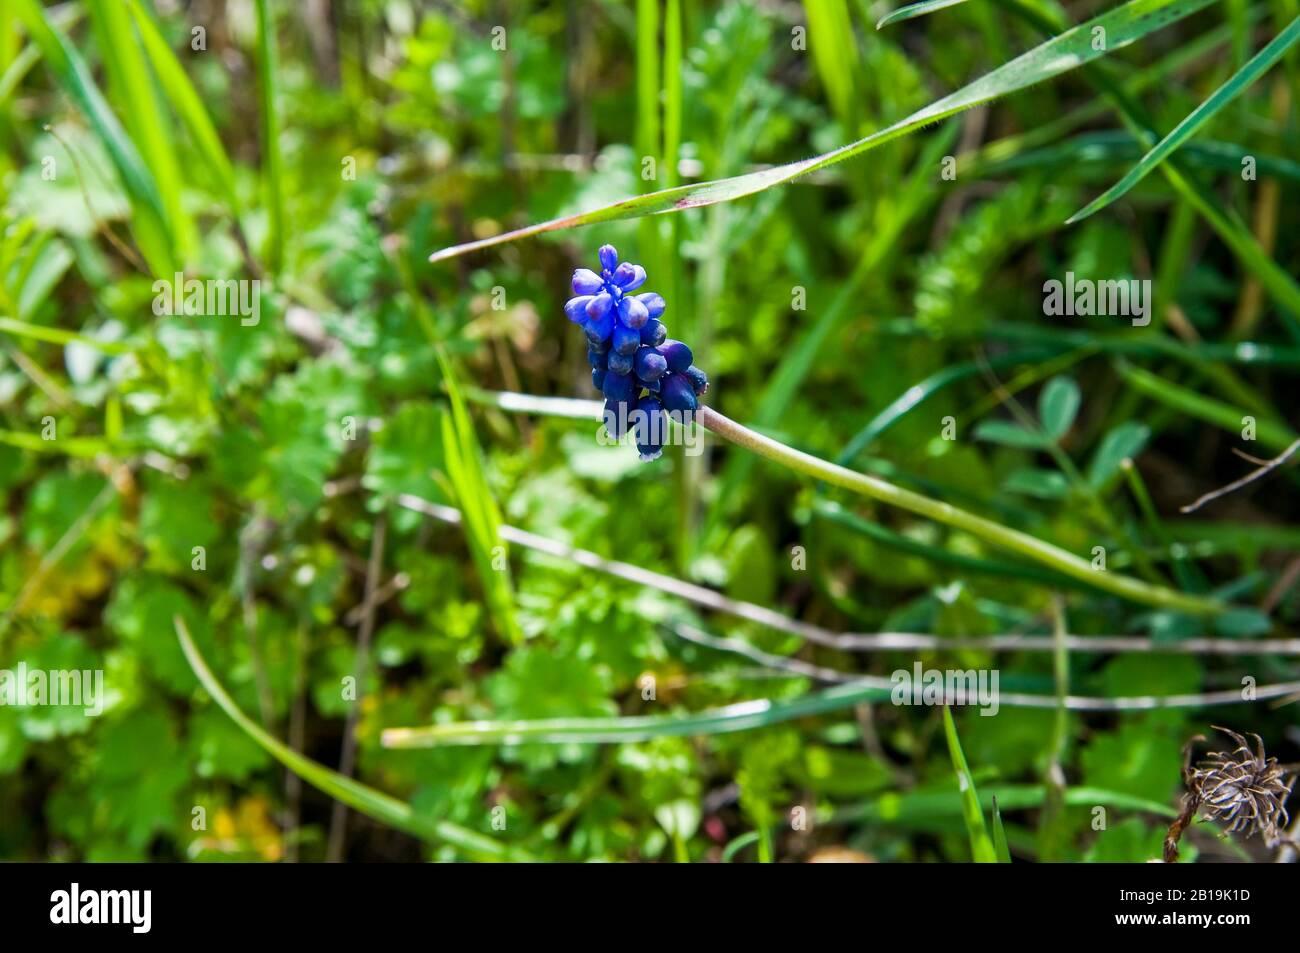 Wild hyacinth. Spanish bluebells Hyacinthoides hispanica. Endymion hispanicus or Scilla hispanica. Hyacinthoides non-scripta. Grape hyacinth. Stock Photo